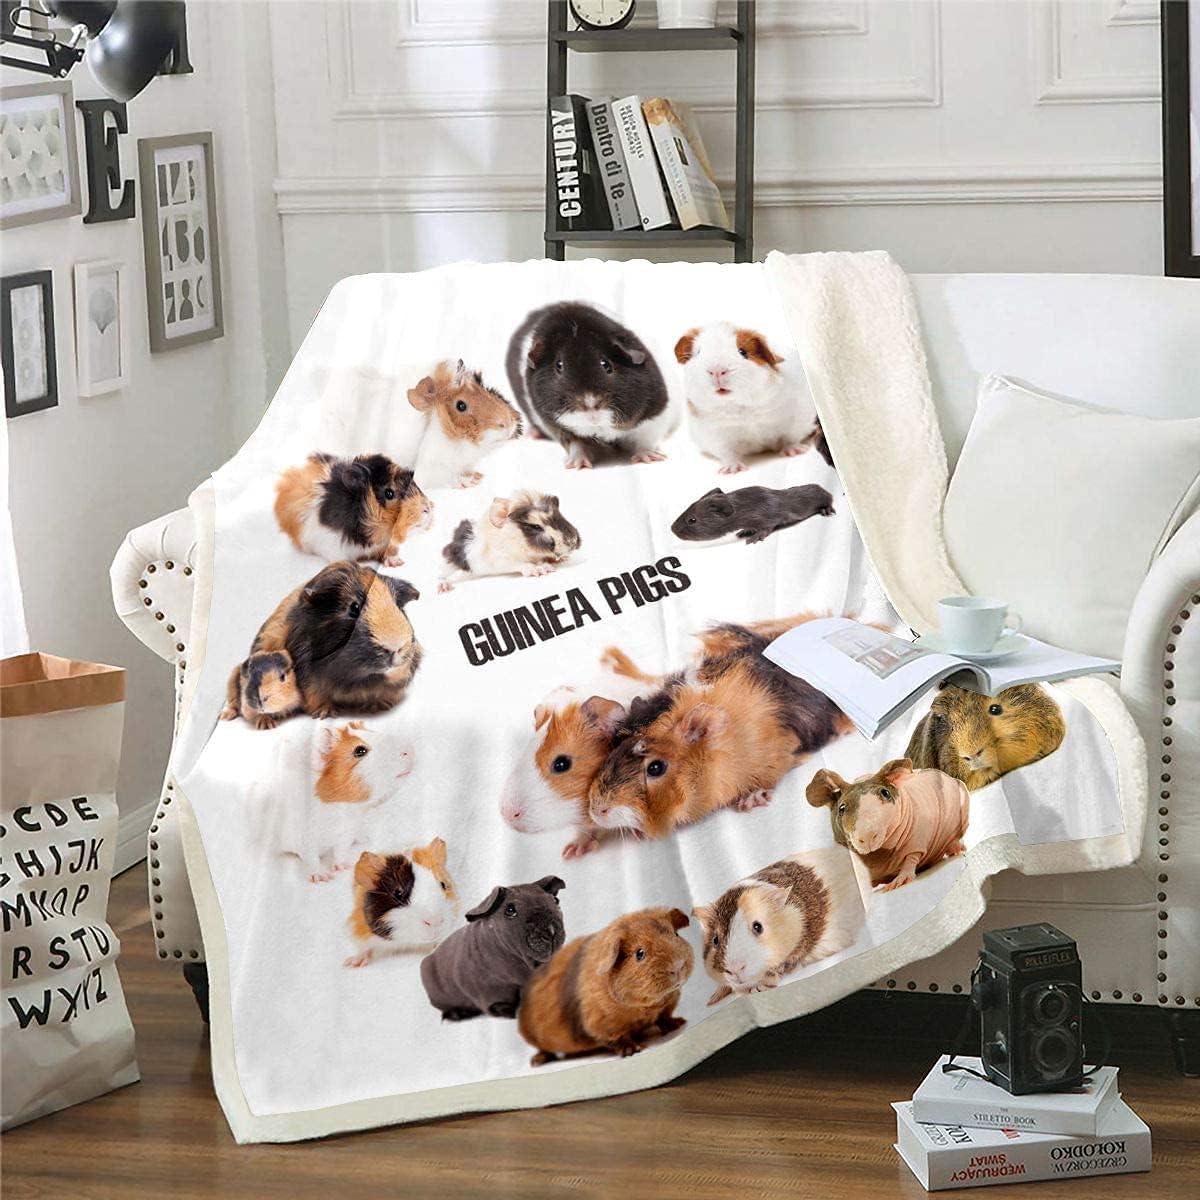 Kids New Free Shipping Guinea Pig Plush Bed Blanket Cute Pet Sherpa Animal Blanke Many popular brands